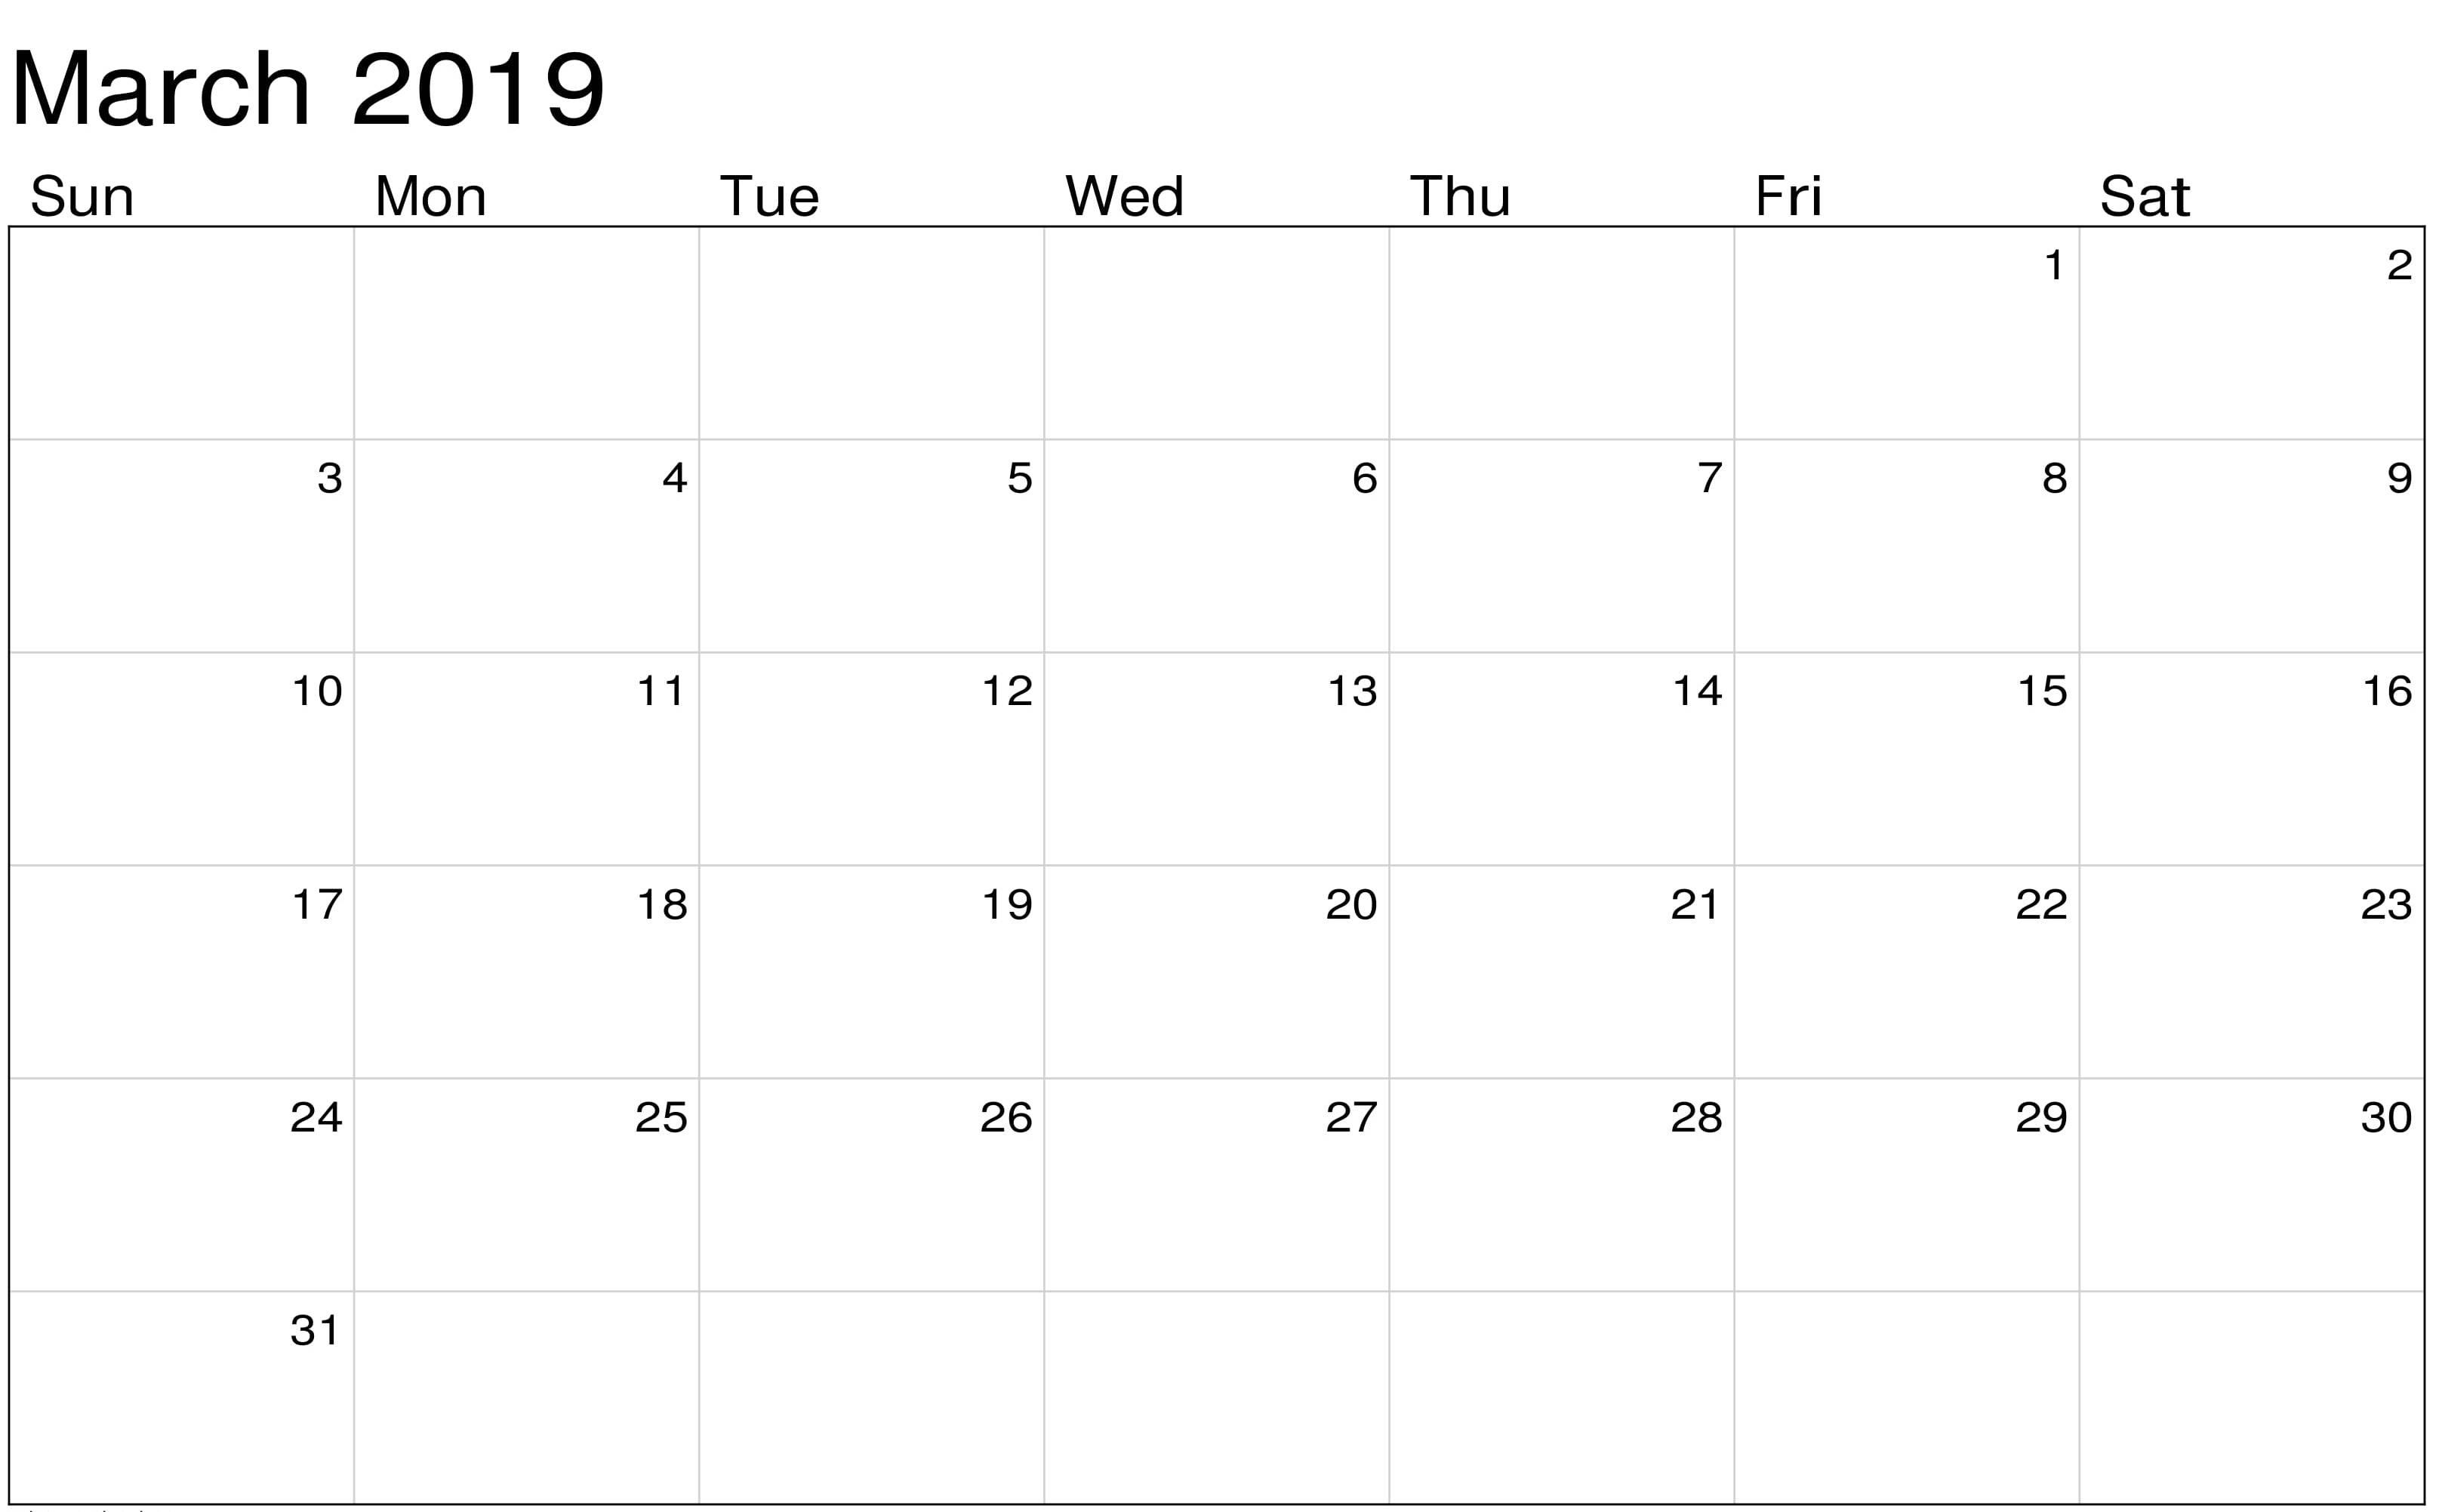 March 2019 Landscape Calendar